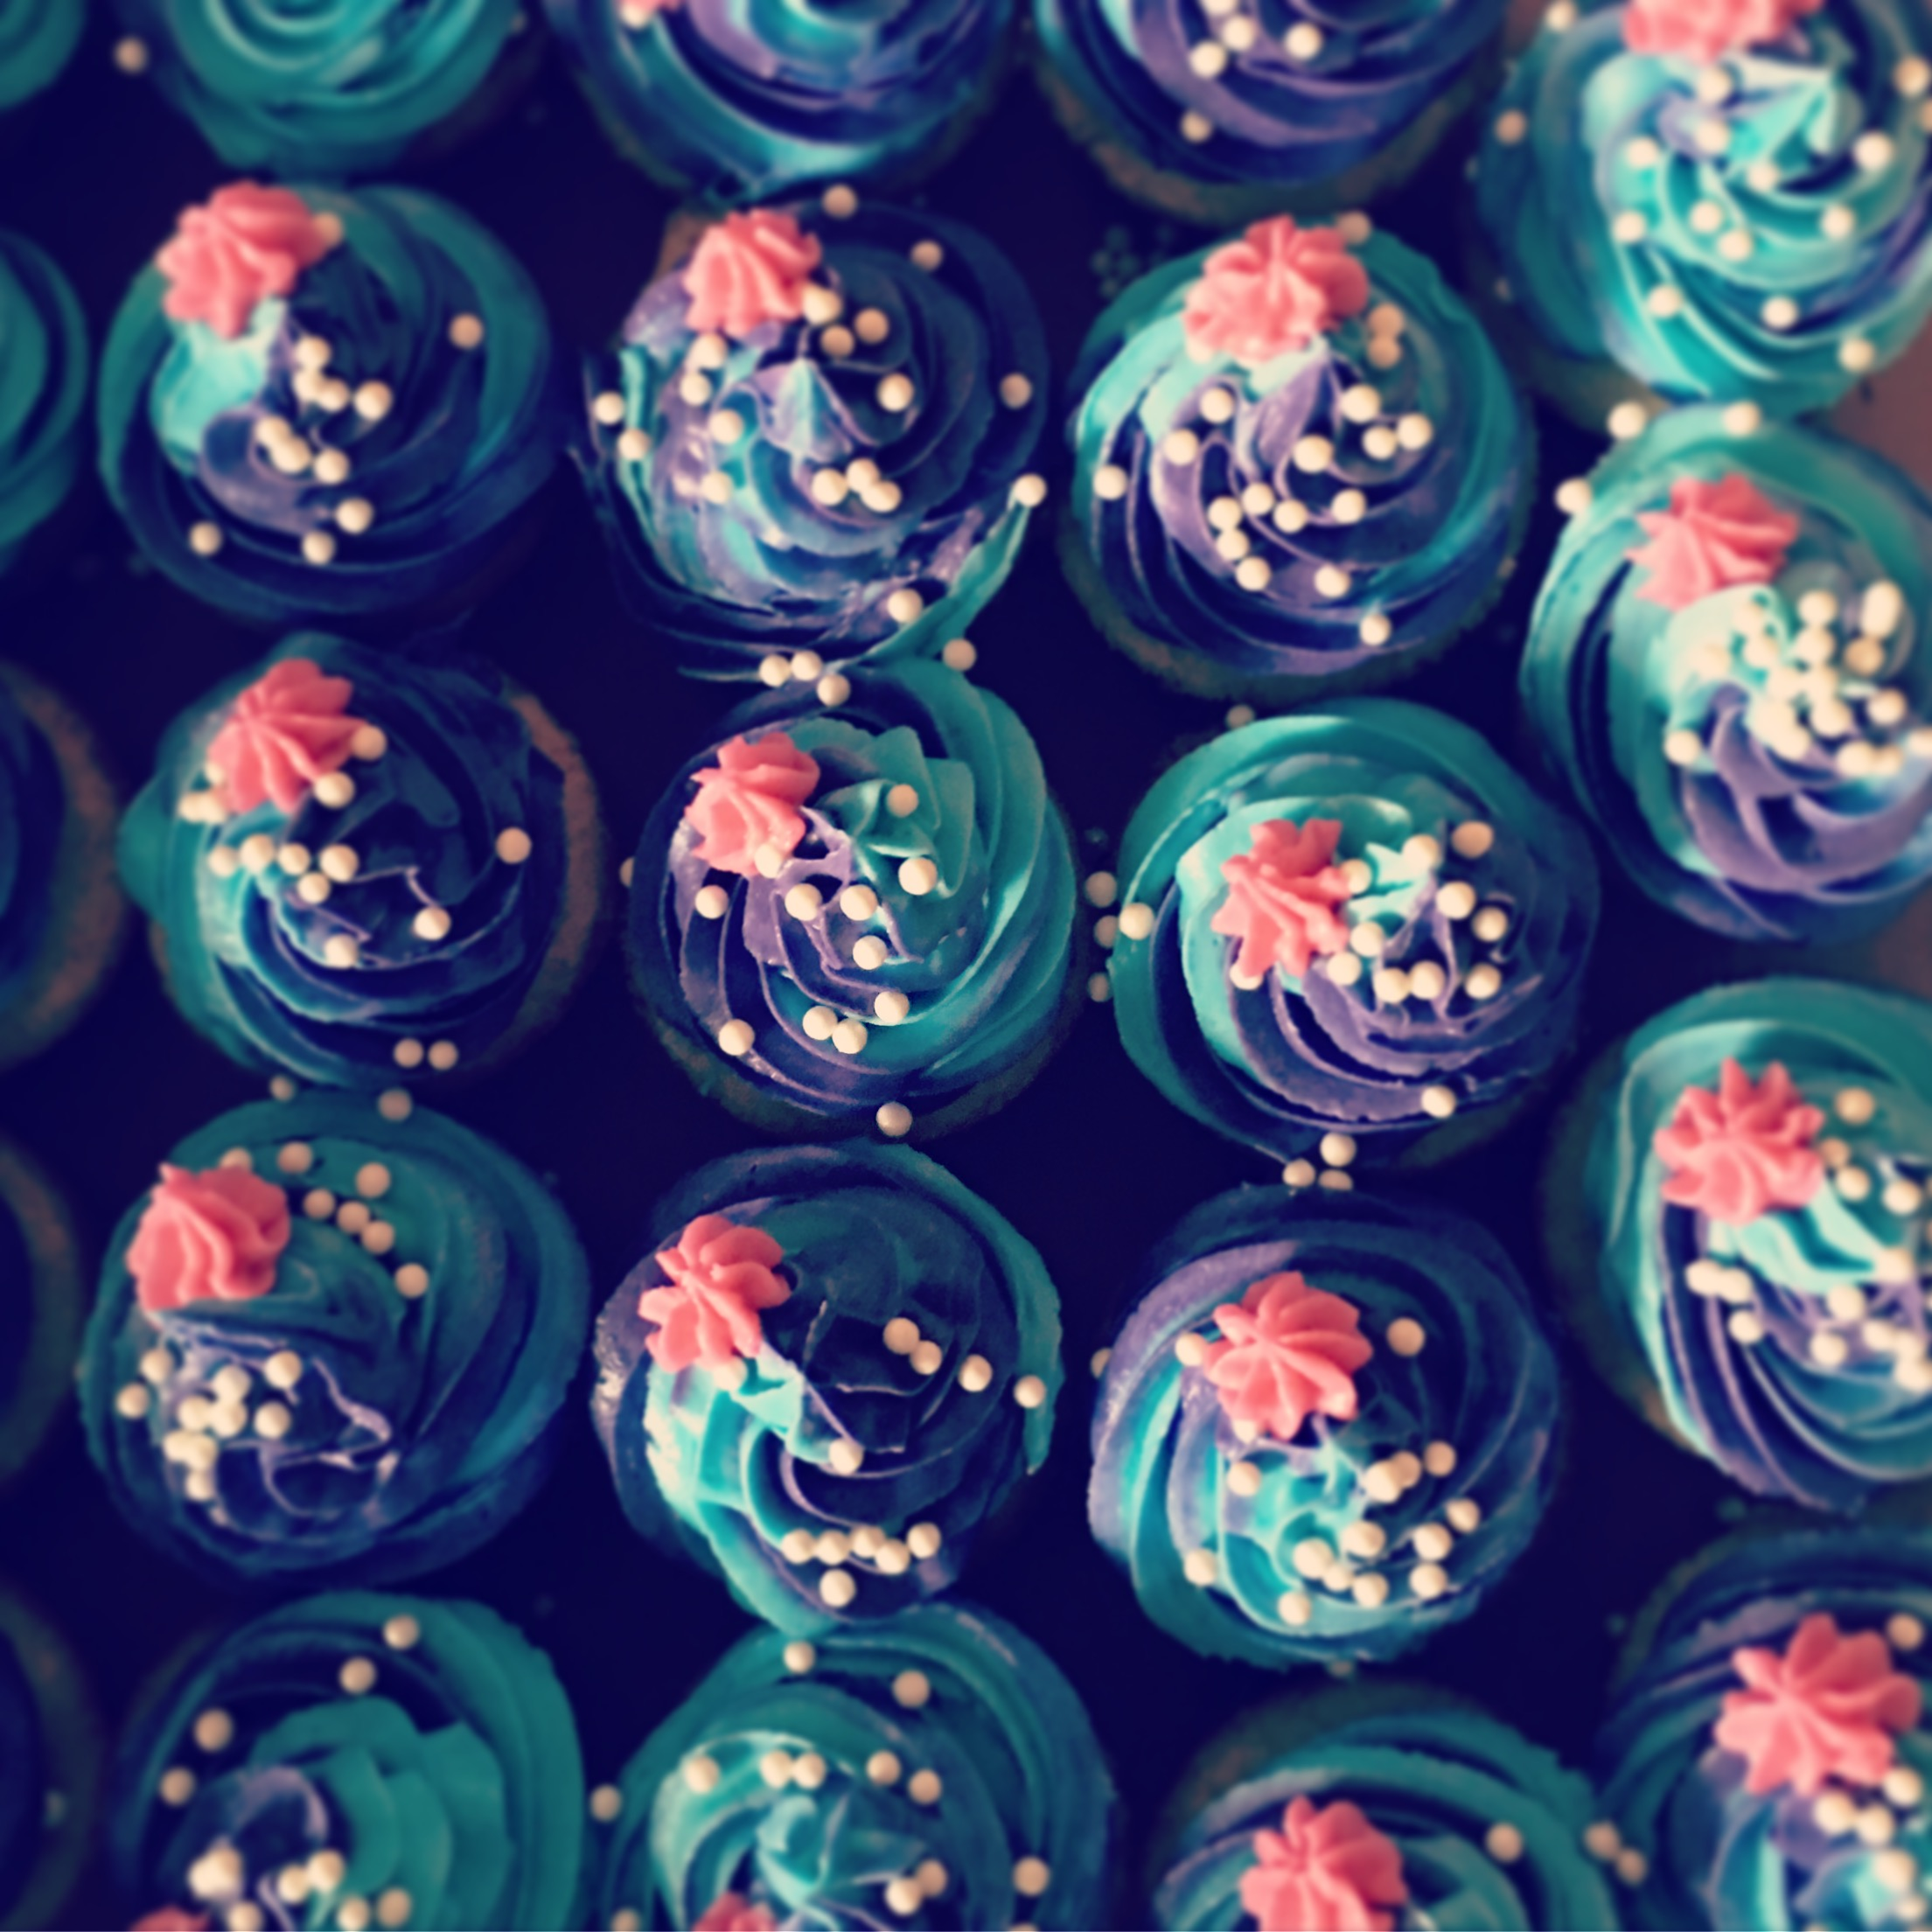 MINI MERMAID CUPCAKES